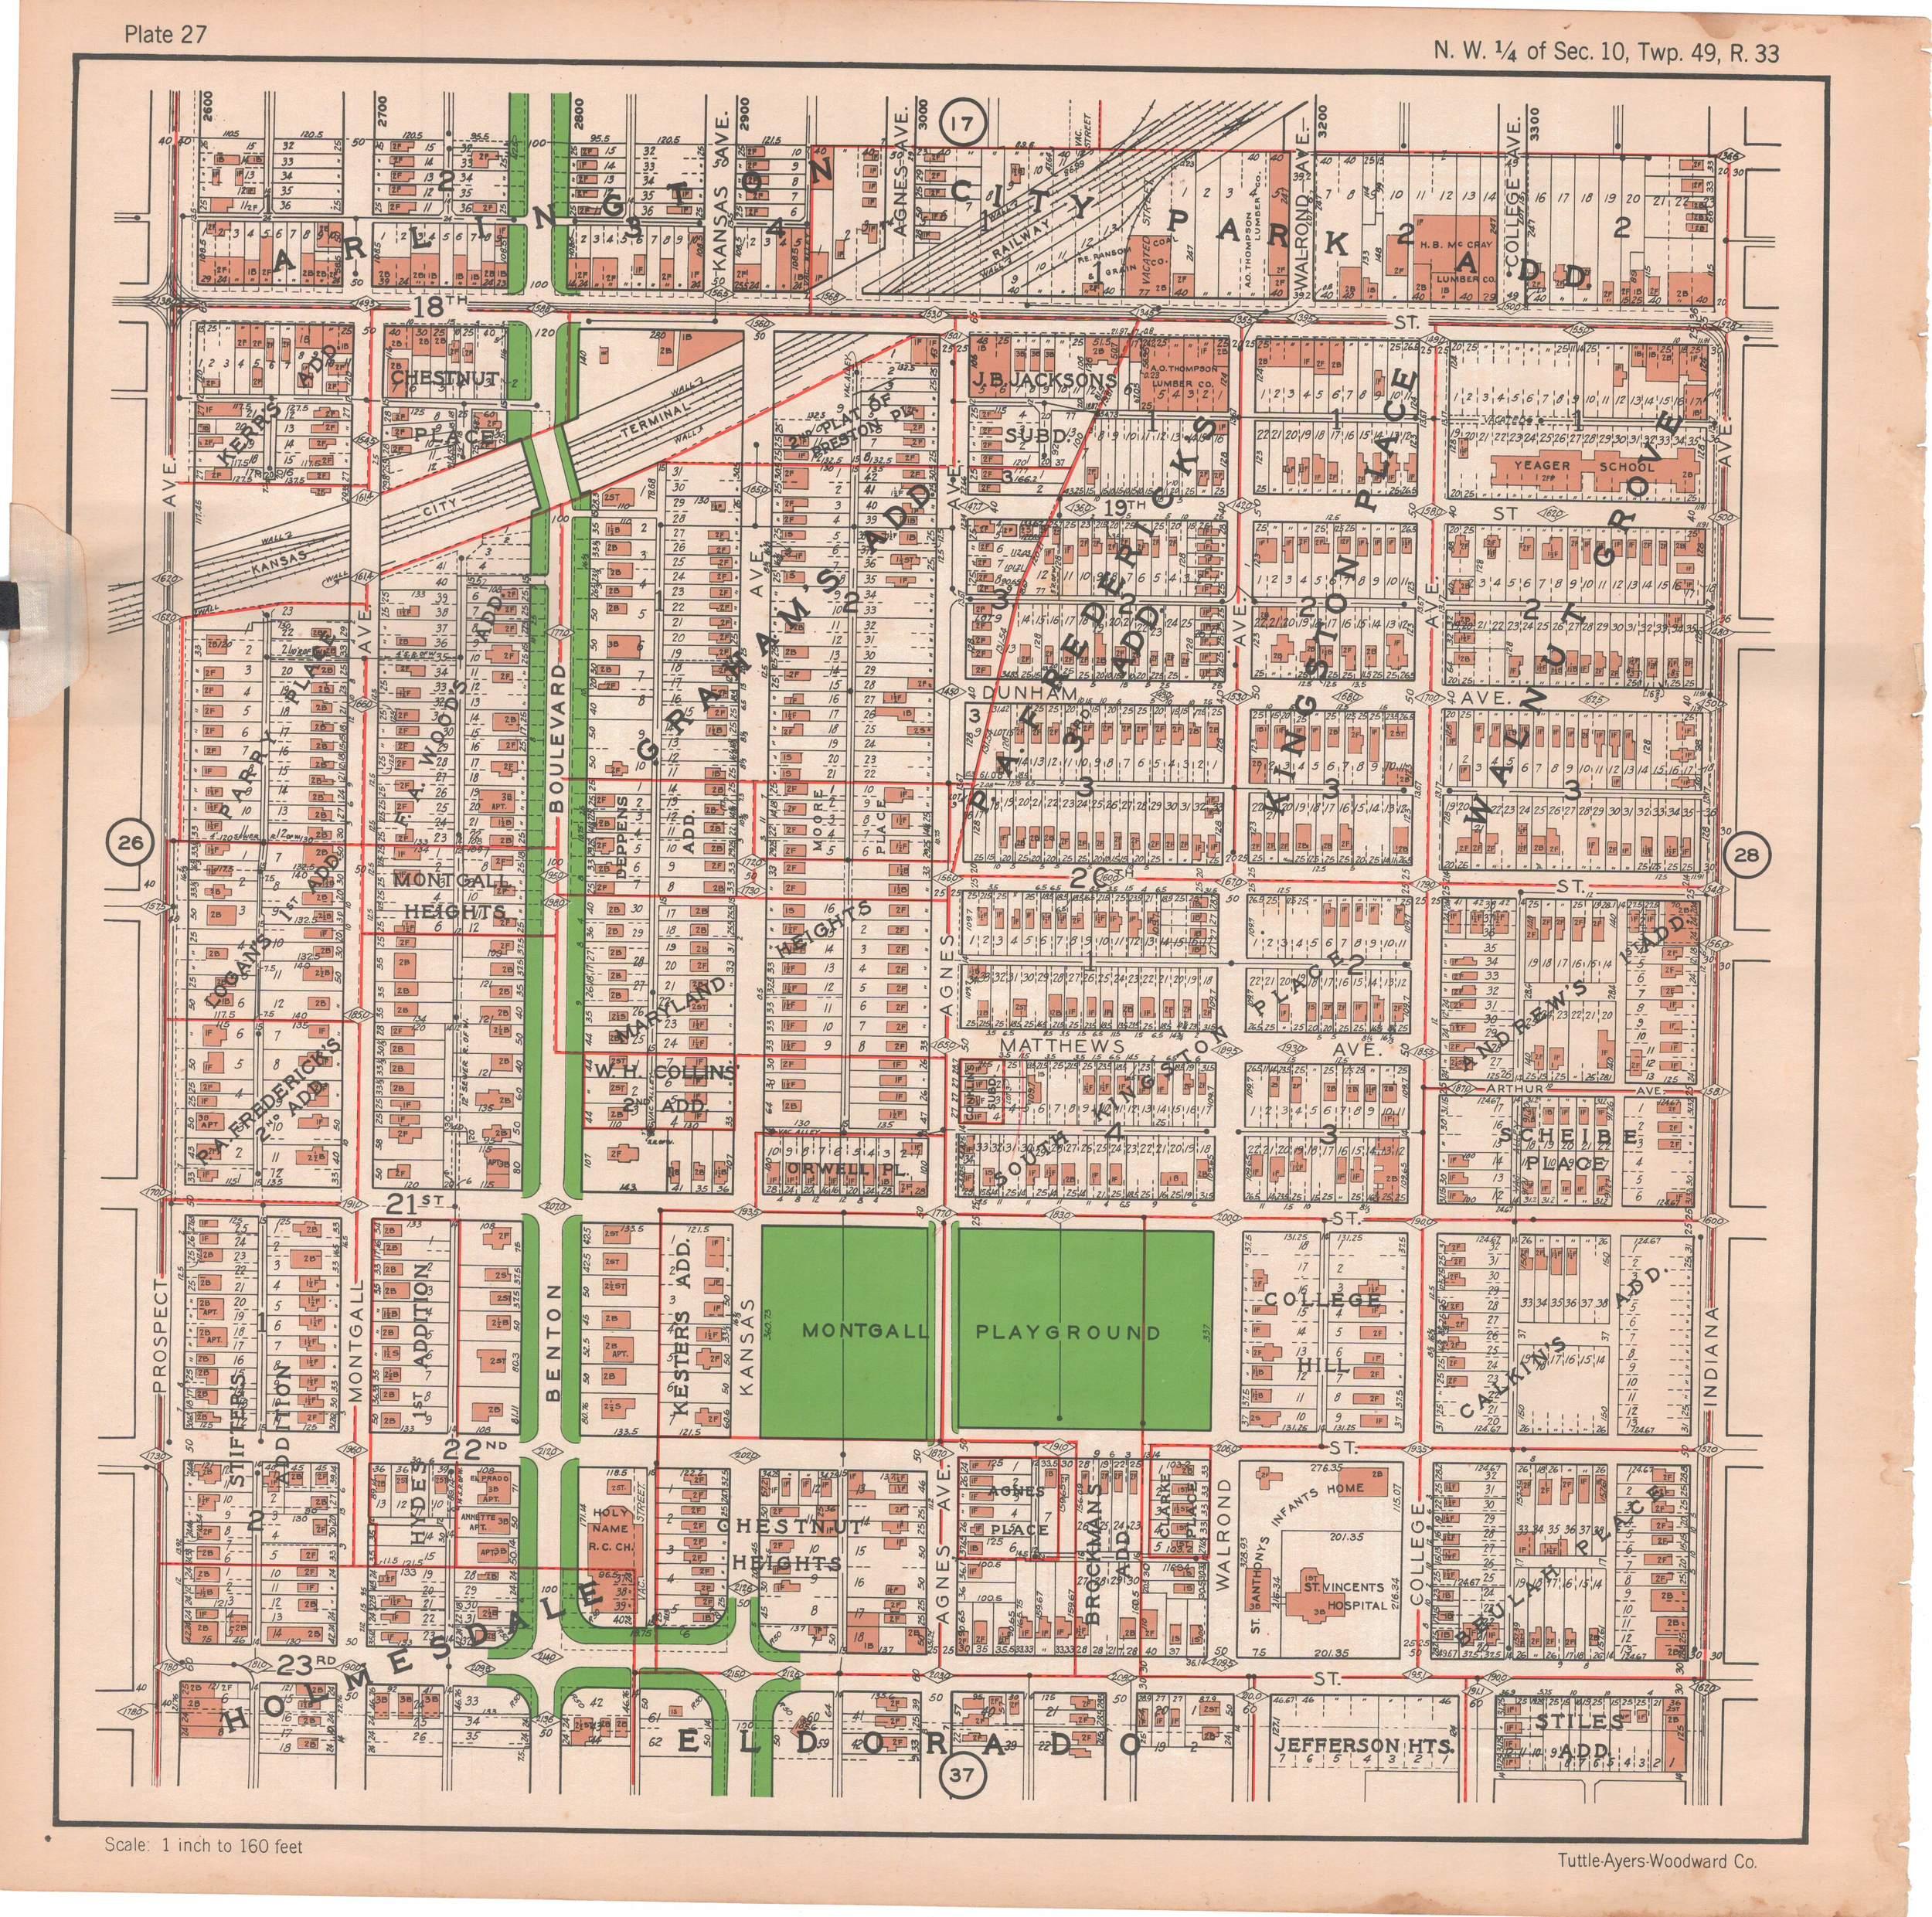 1925 TUTTLE_AYERS_Plate 27.JPG